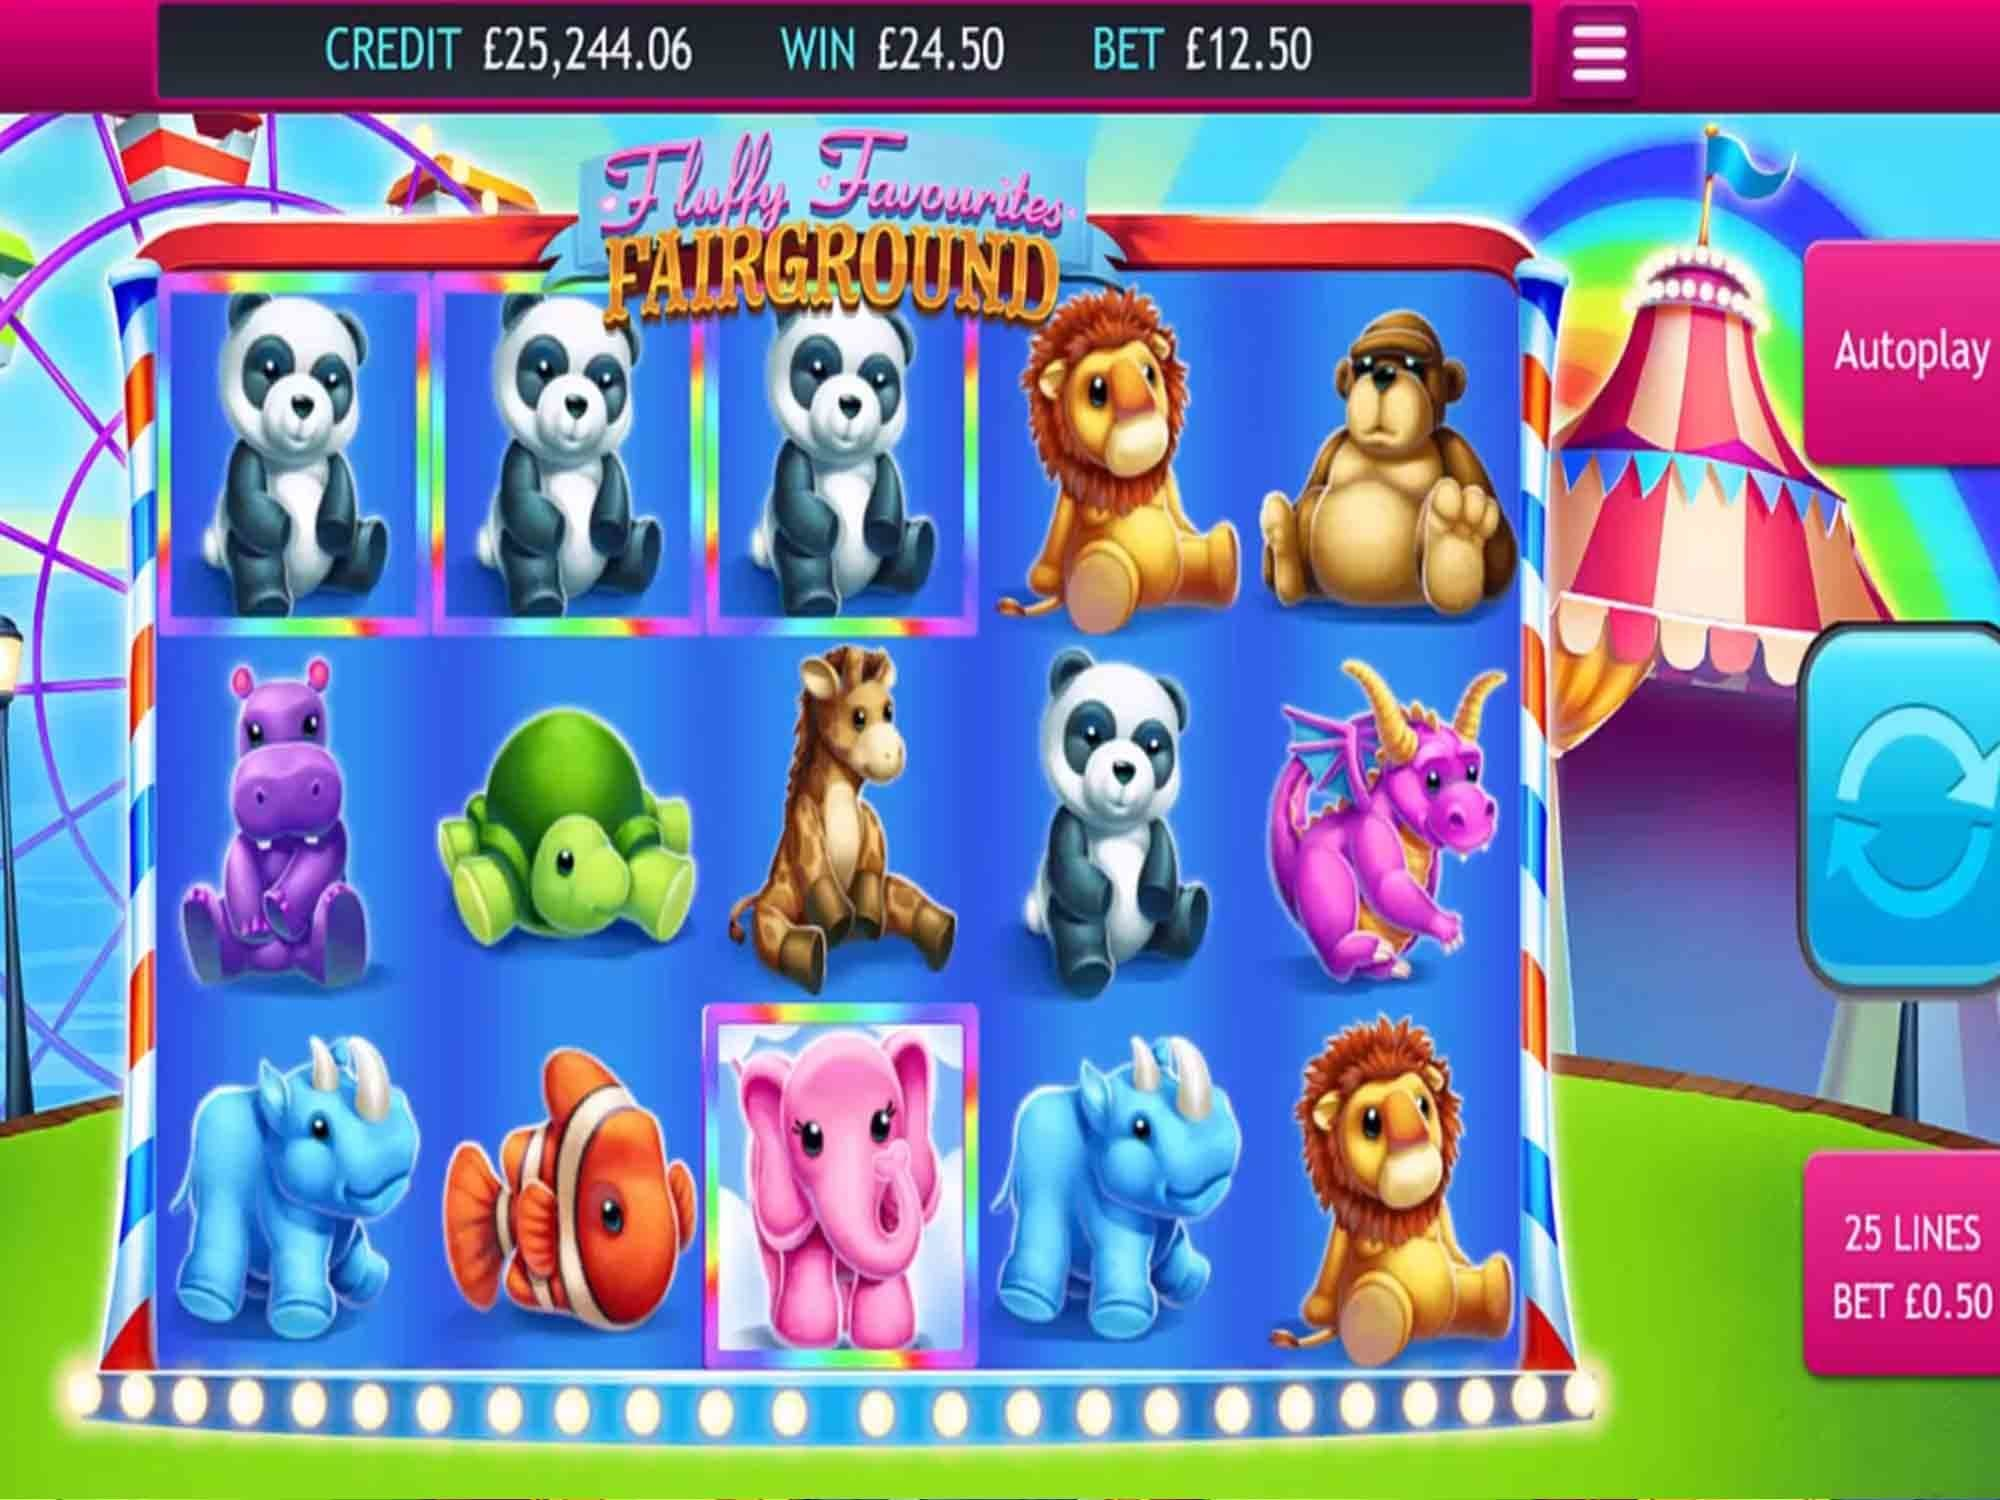 fluffy favourites fairground gameplay casino